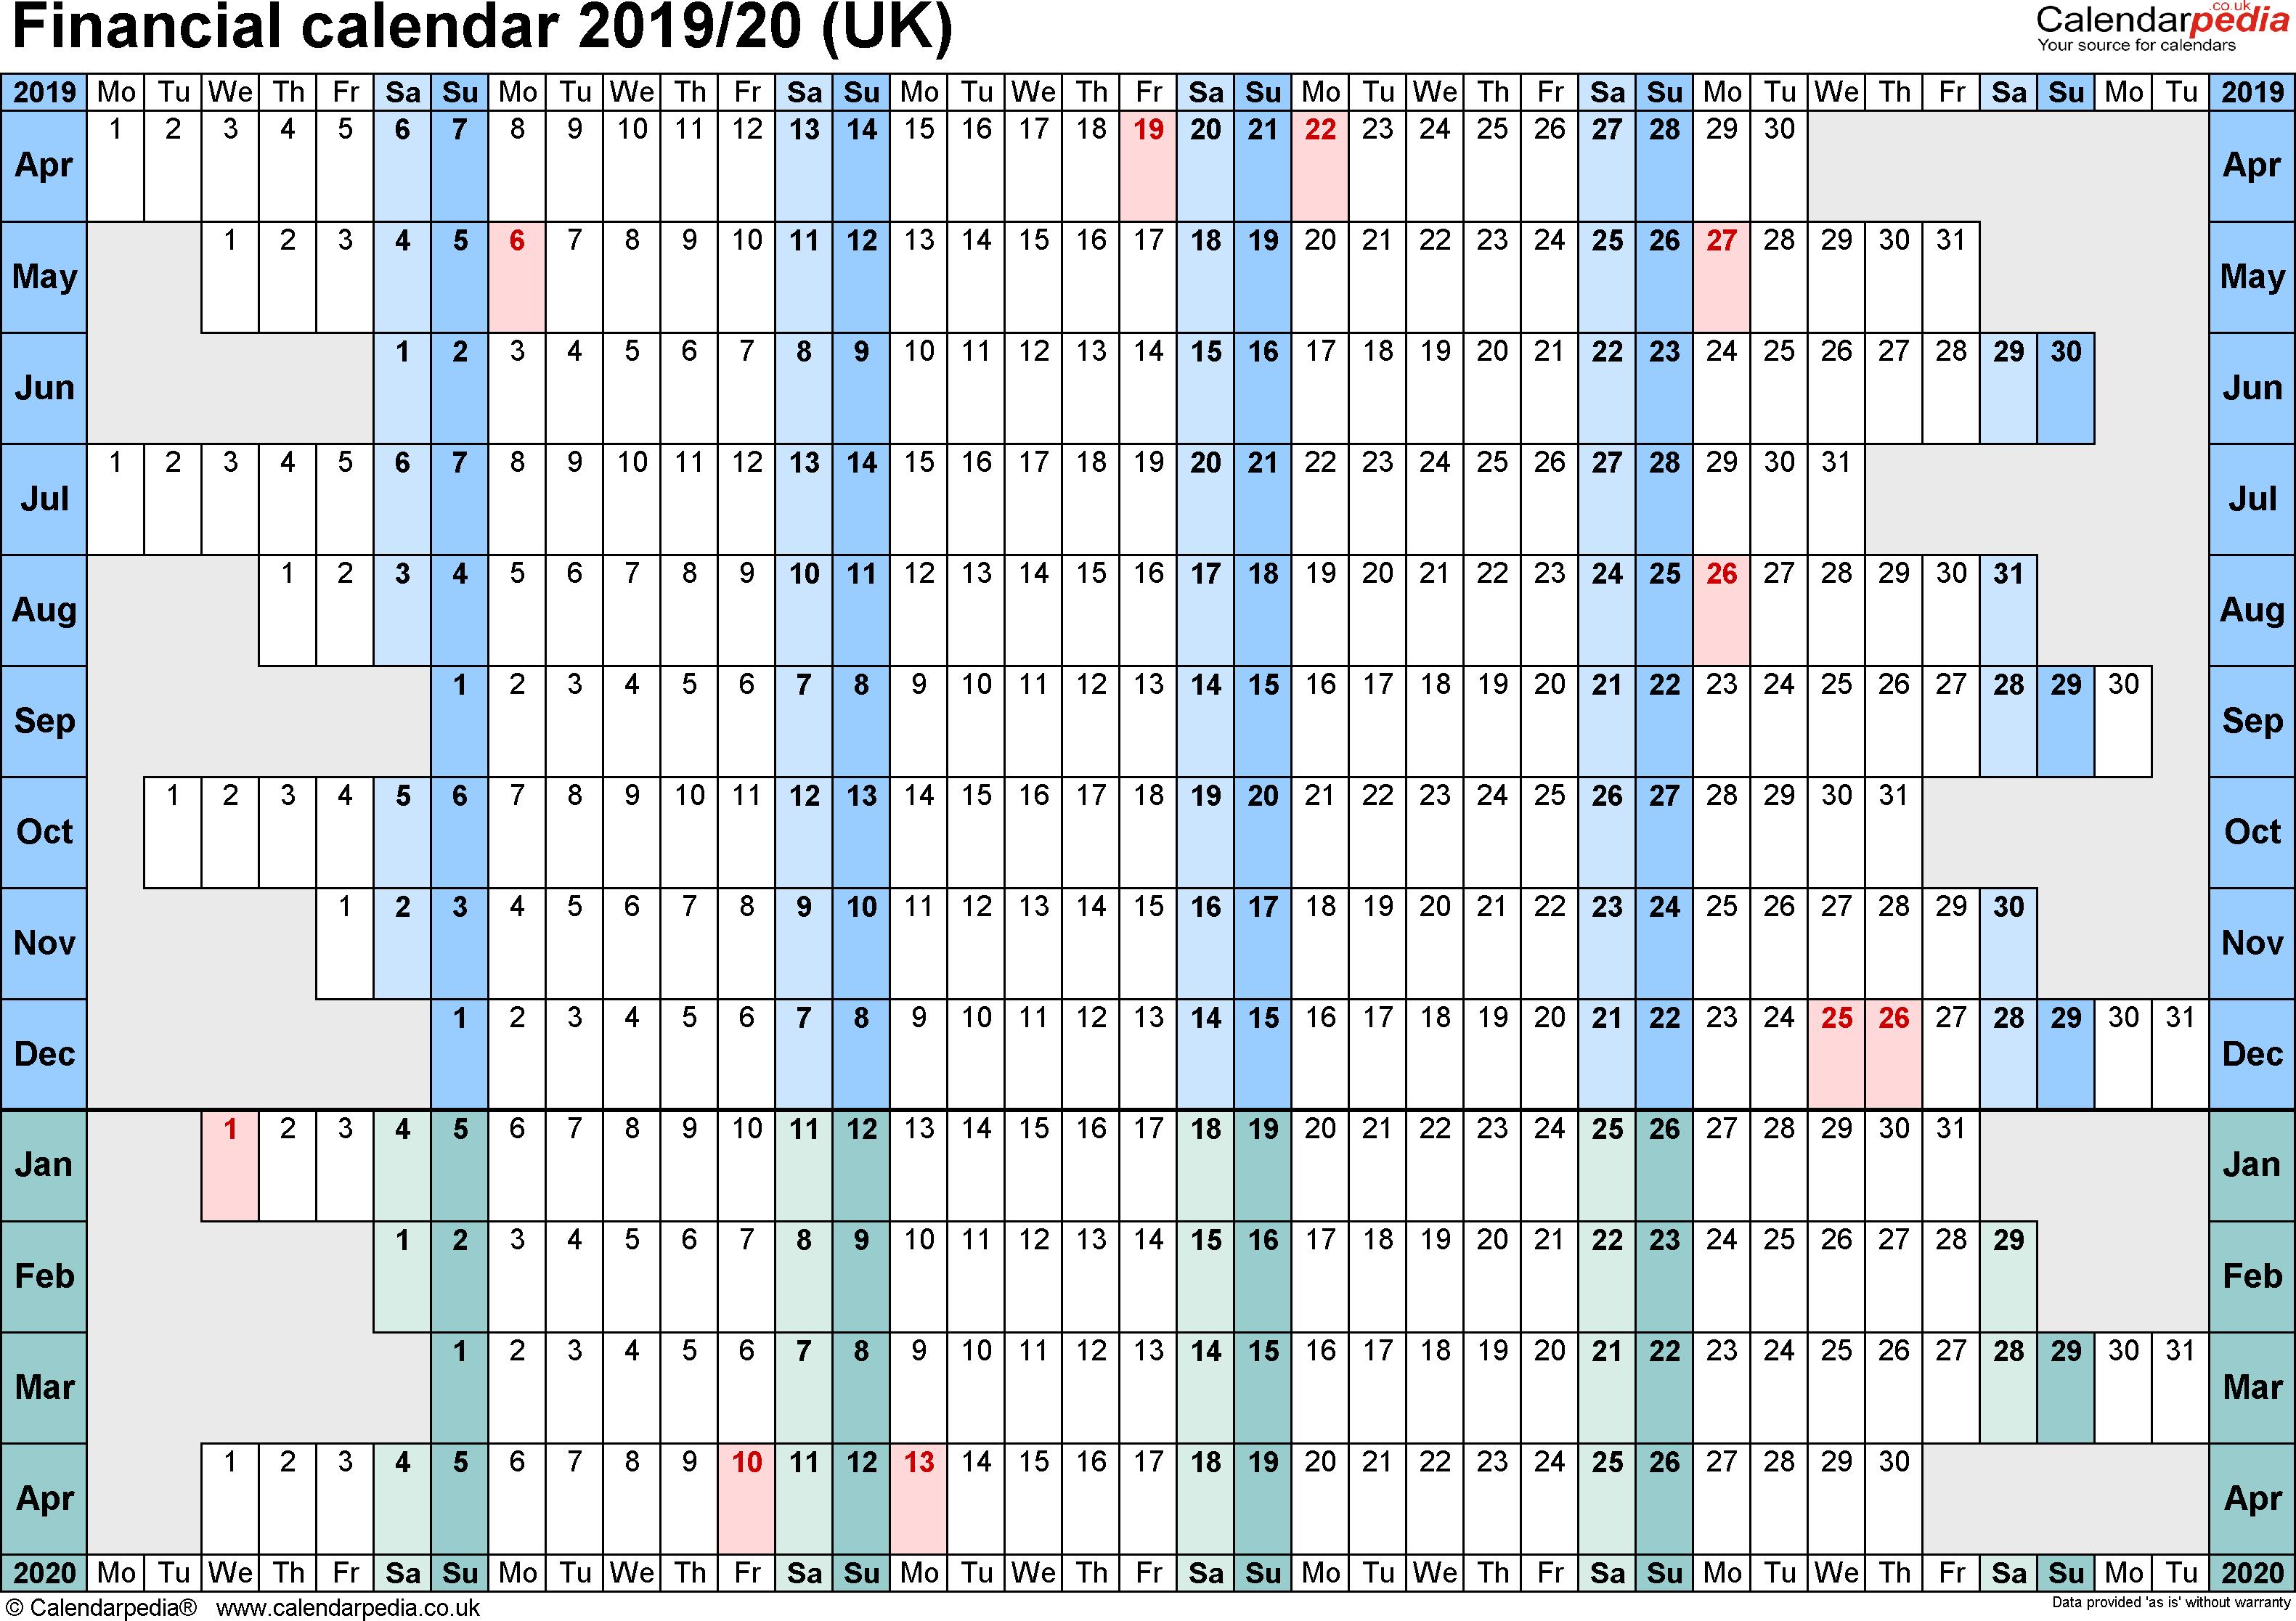 Financial Calendars 2019/20 (Uk) In Microsoft Excel Format